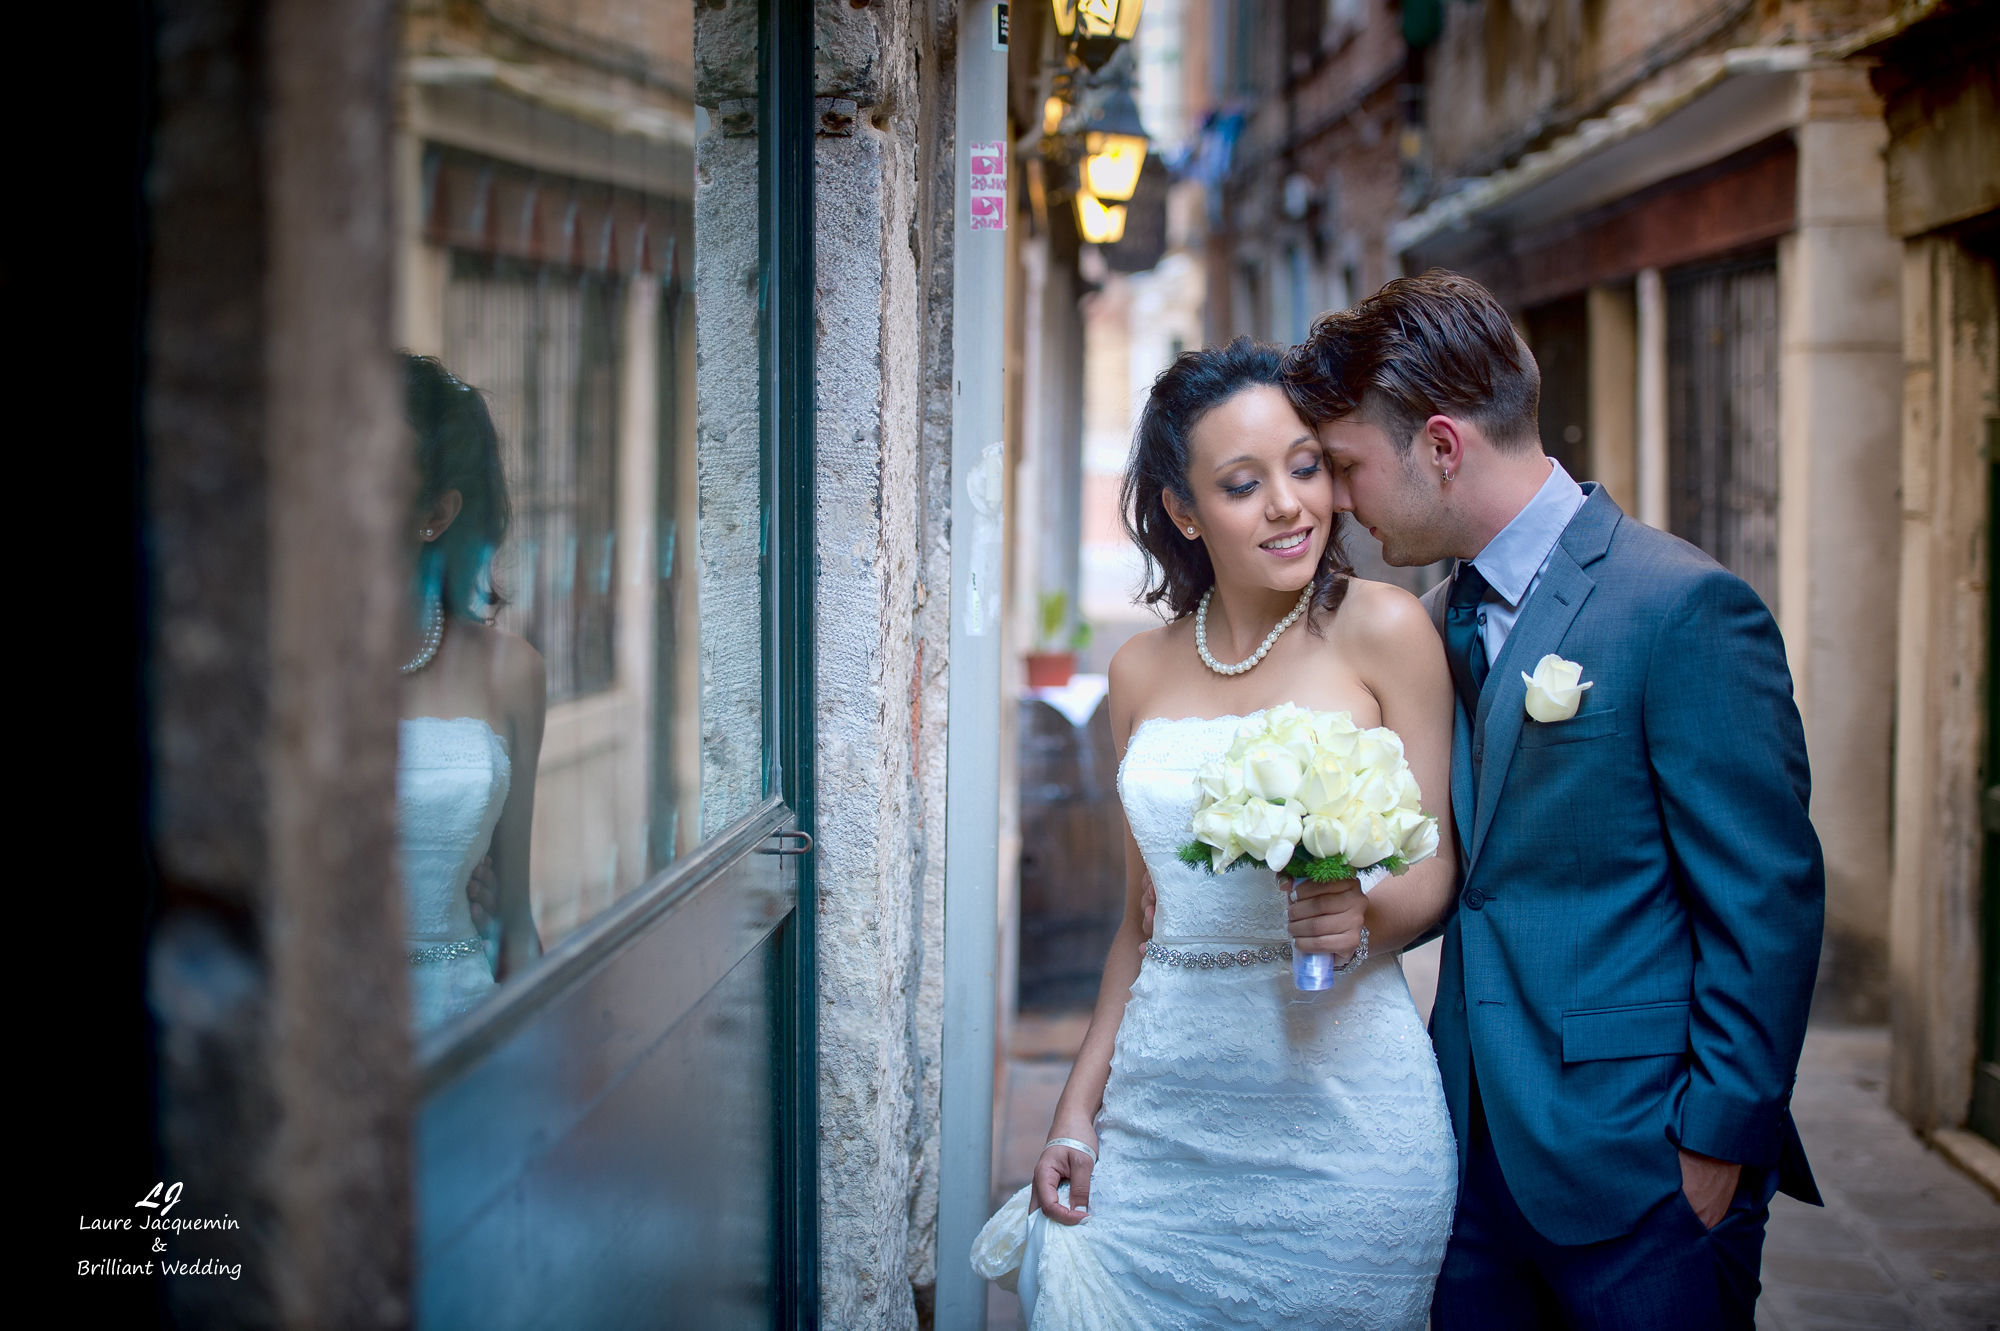 Venice Simbolic Wedding gondola venice Italy laure jacquemin photography (15) copia